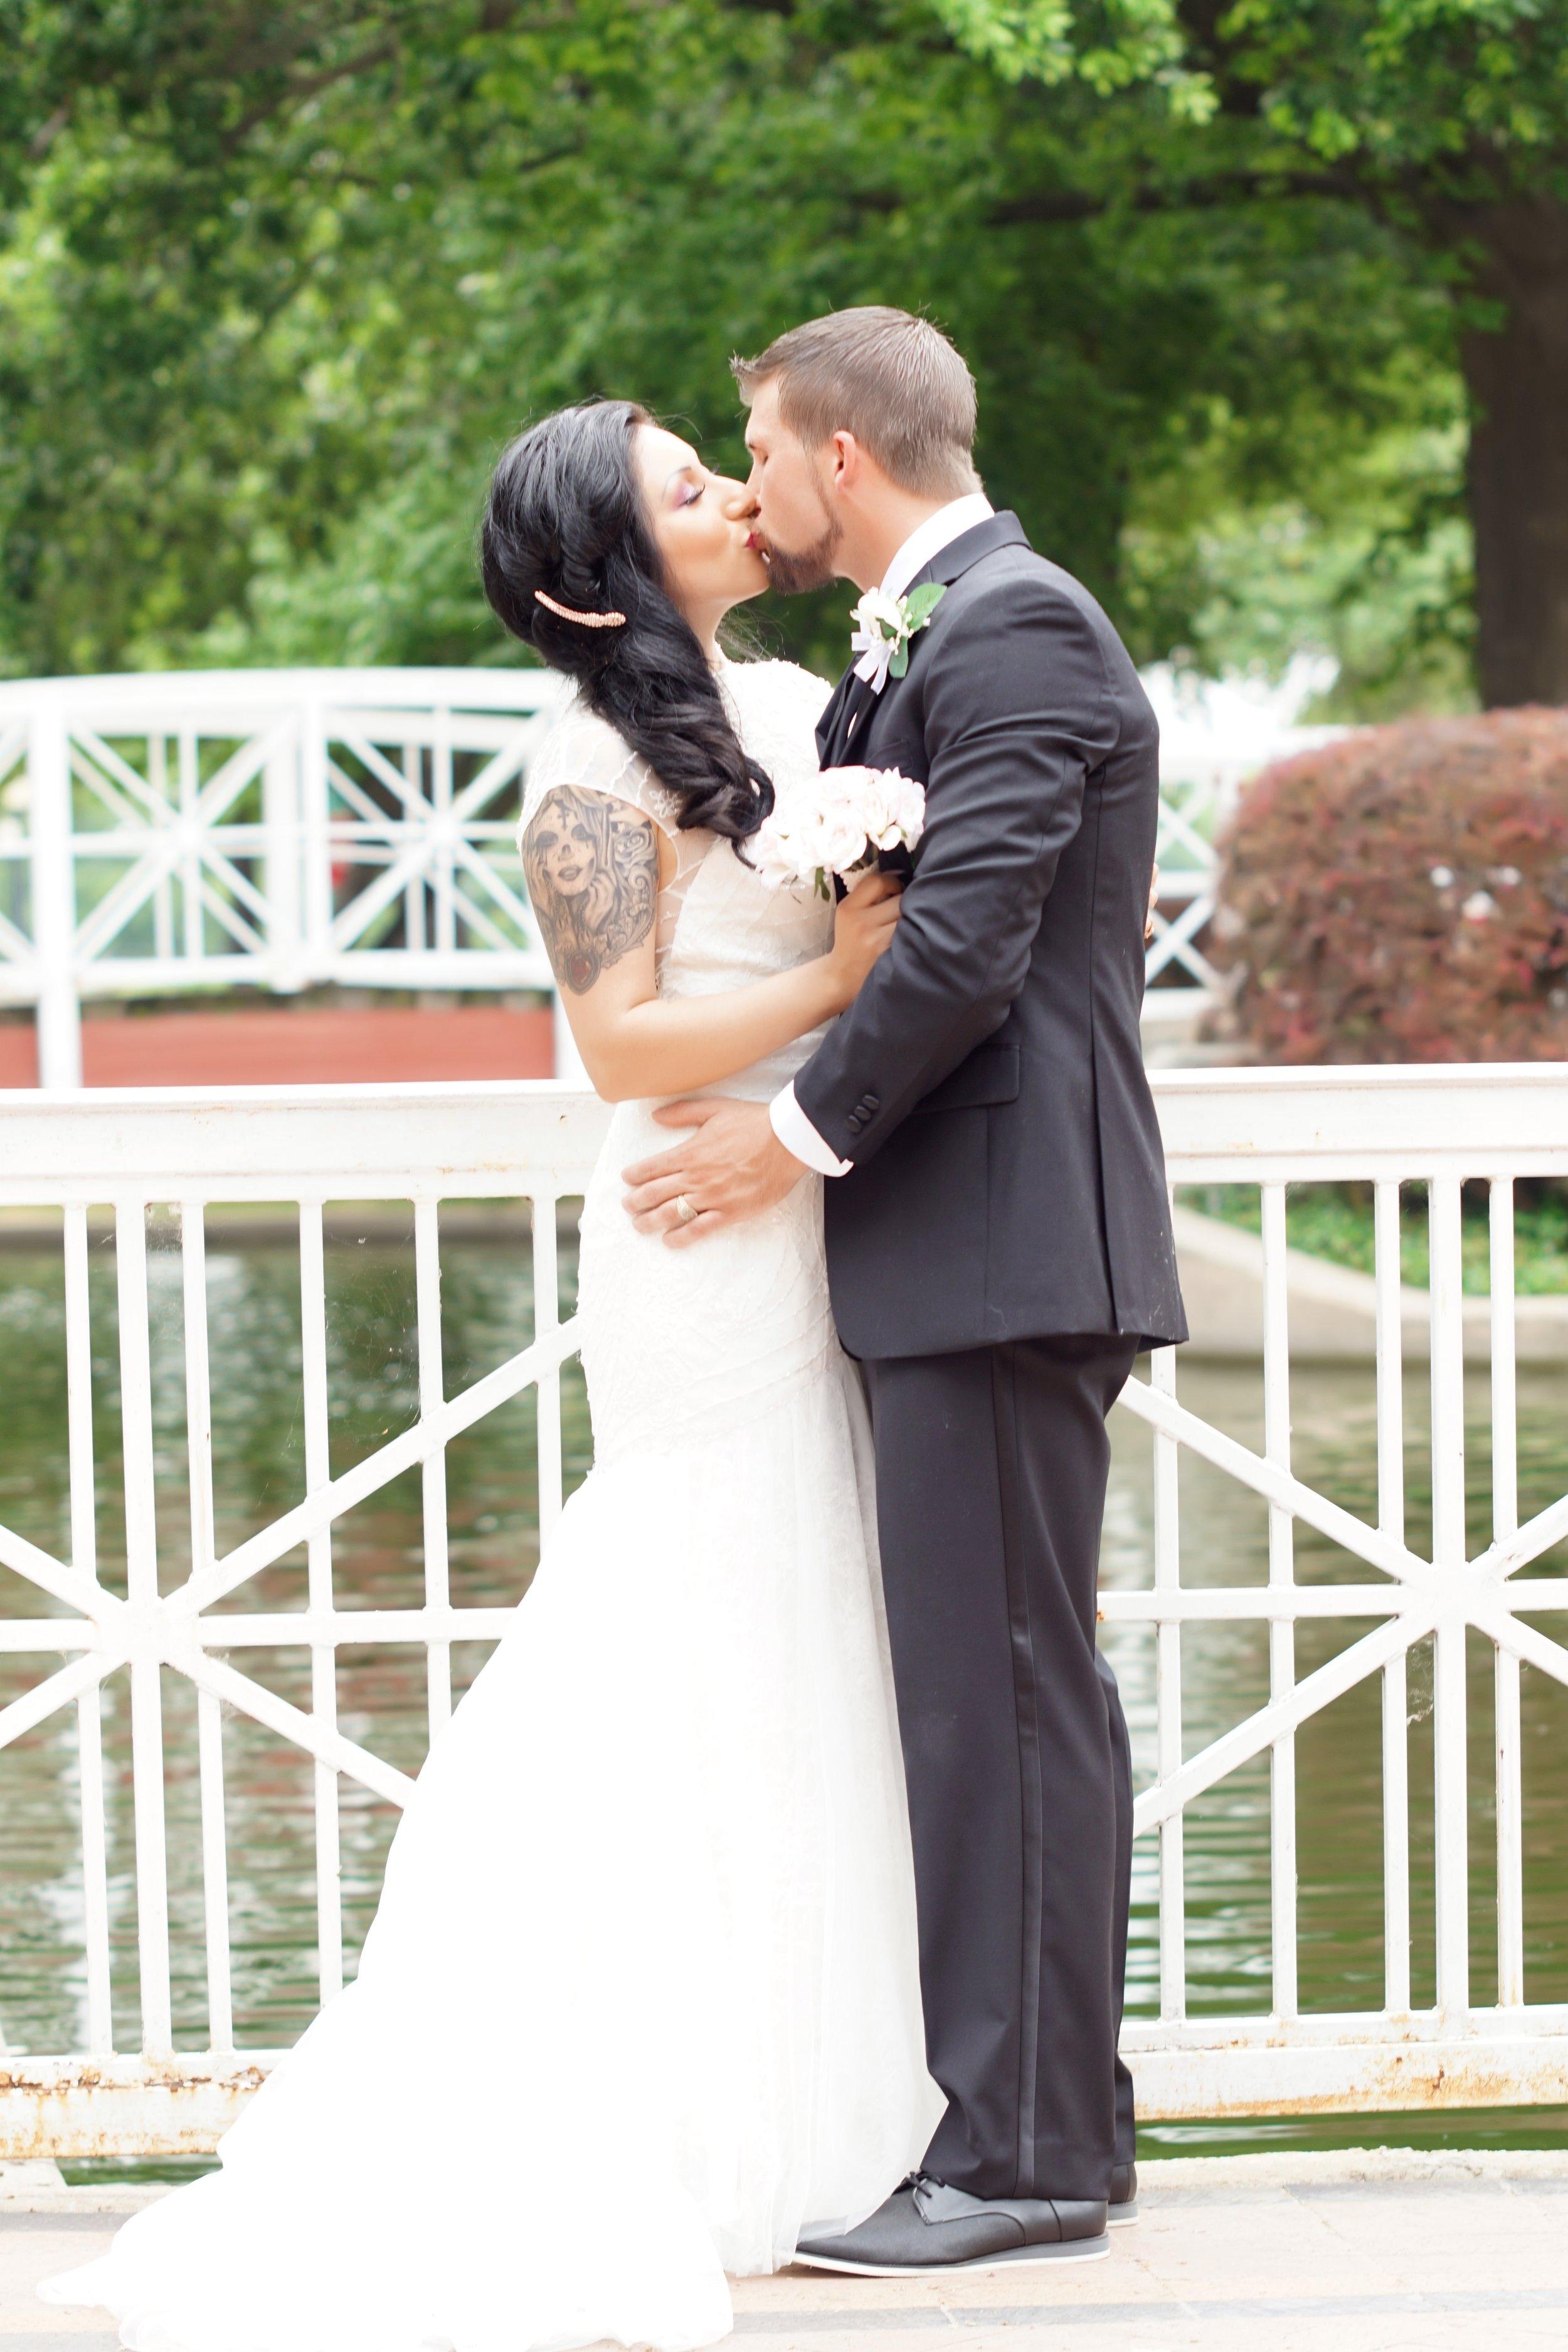 ammiya & Bret's Wedding - PLANO TEXAS